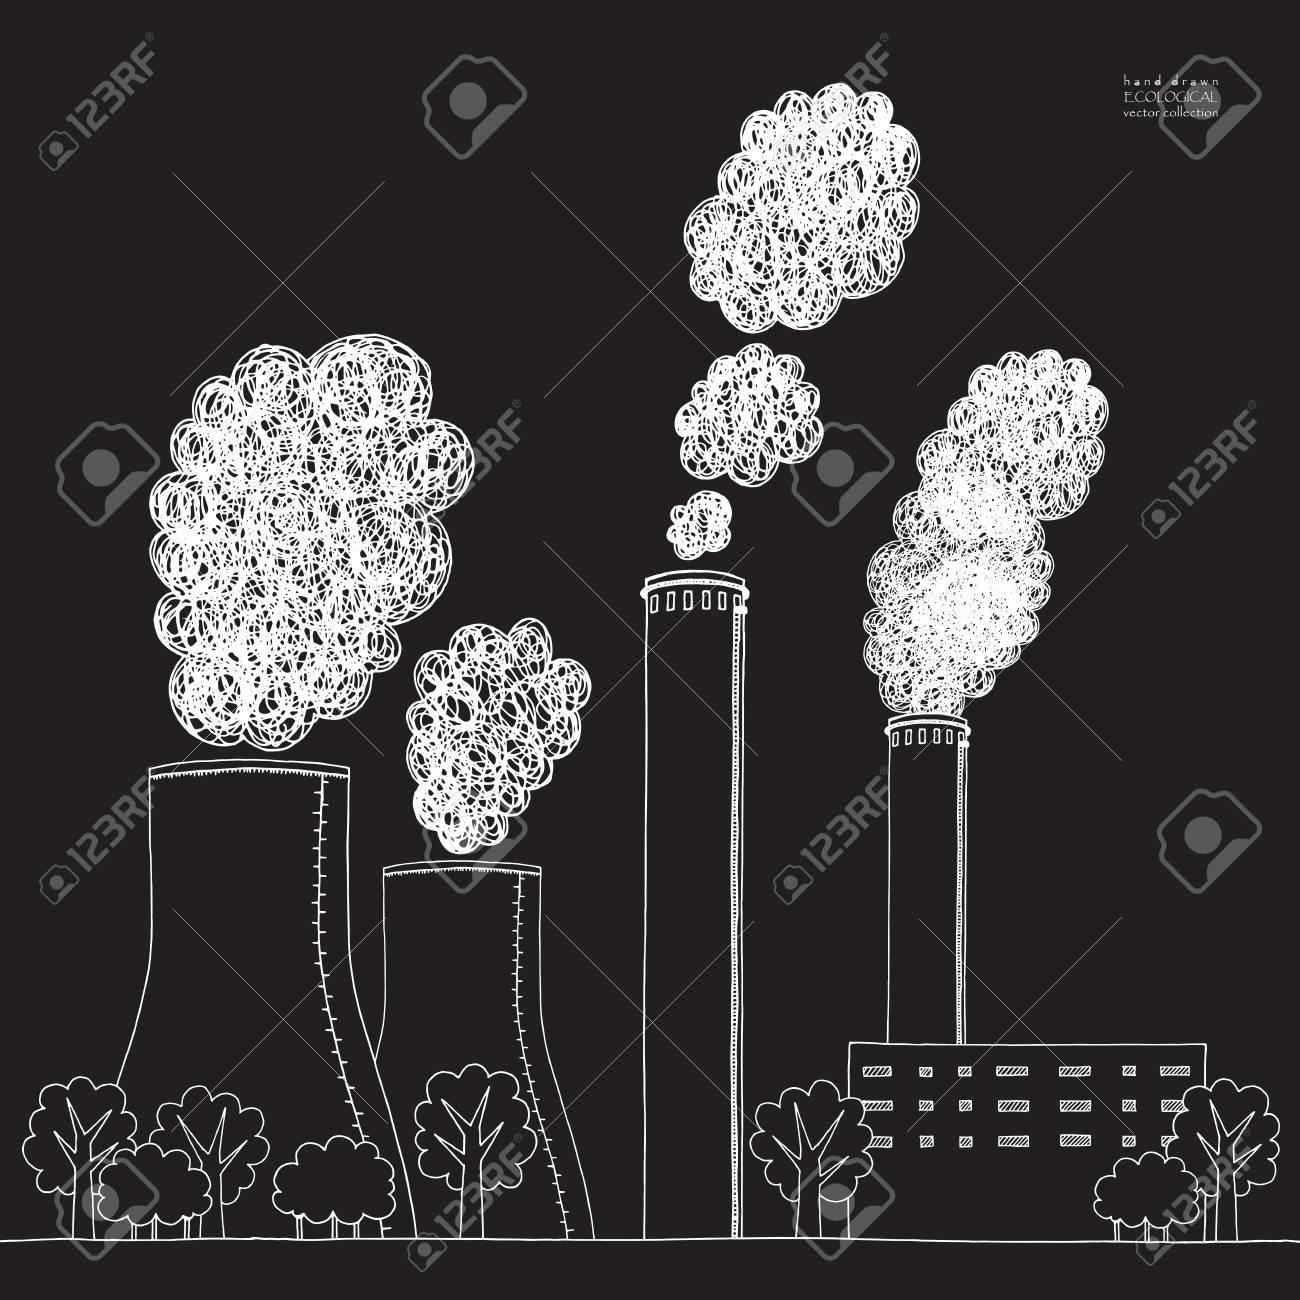 White smokestack on black background illustration of air pollution